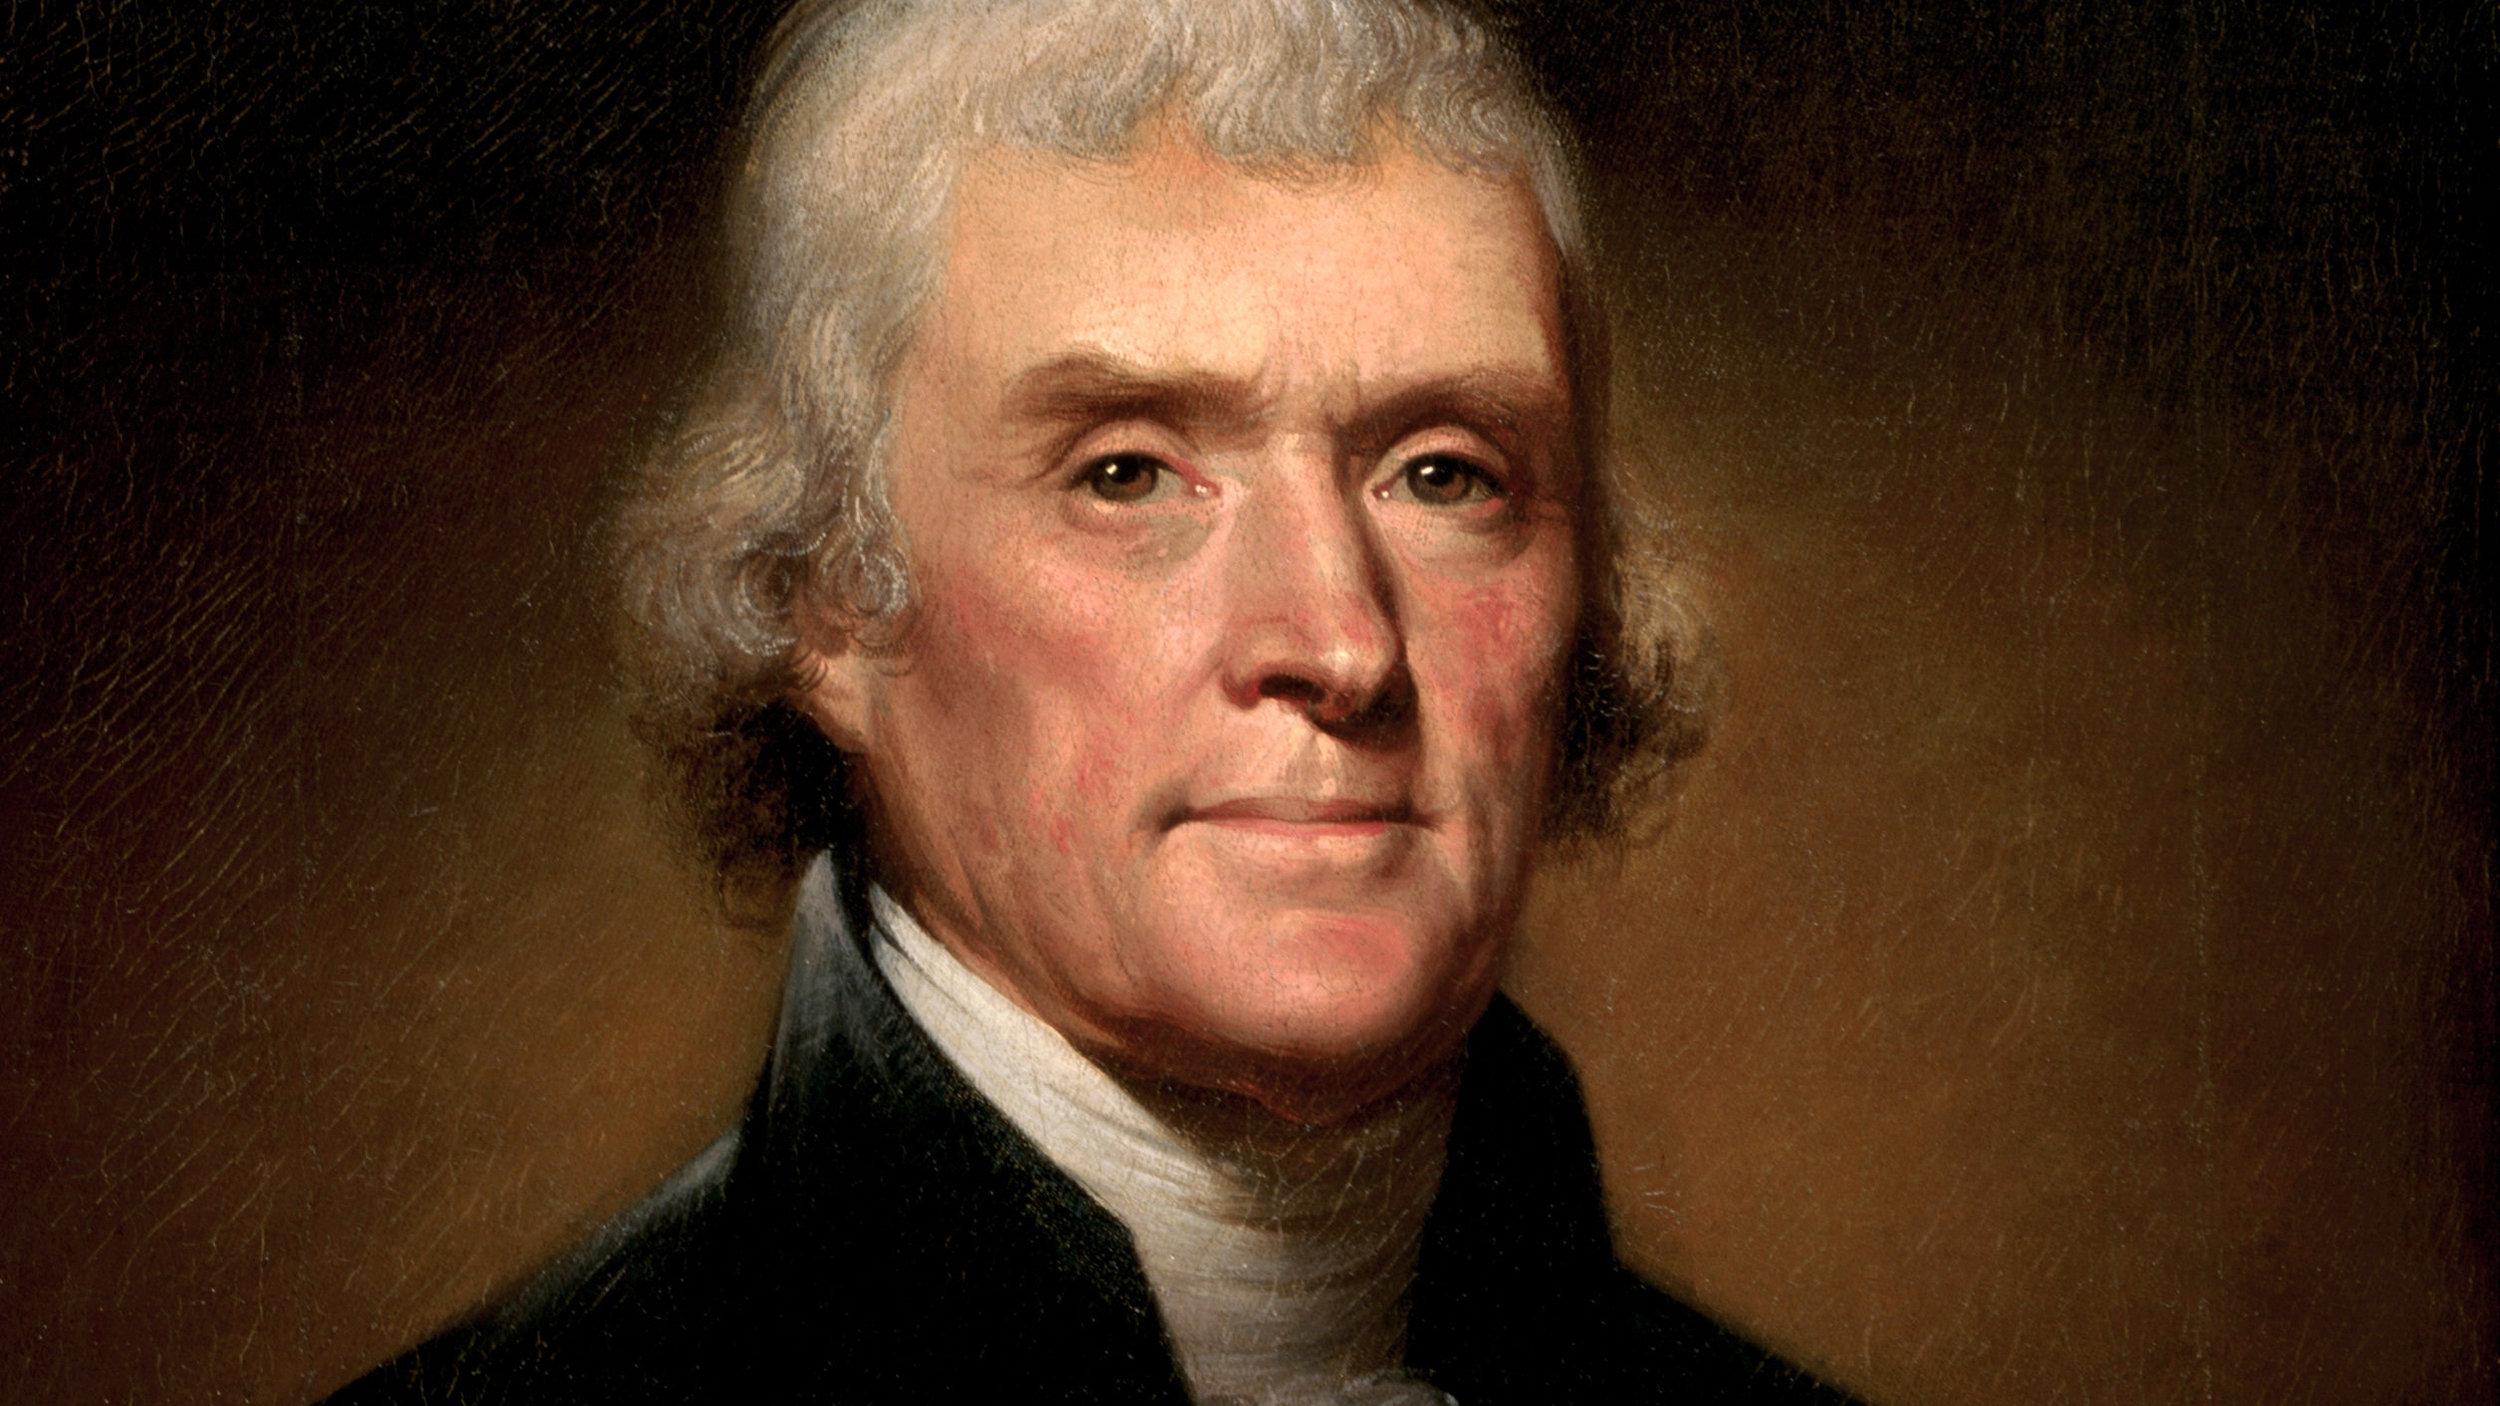 Jefferson's Second American Revolution - The Jefferson Watch